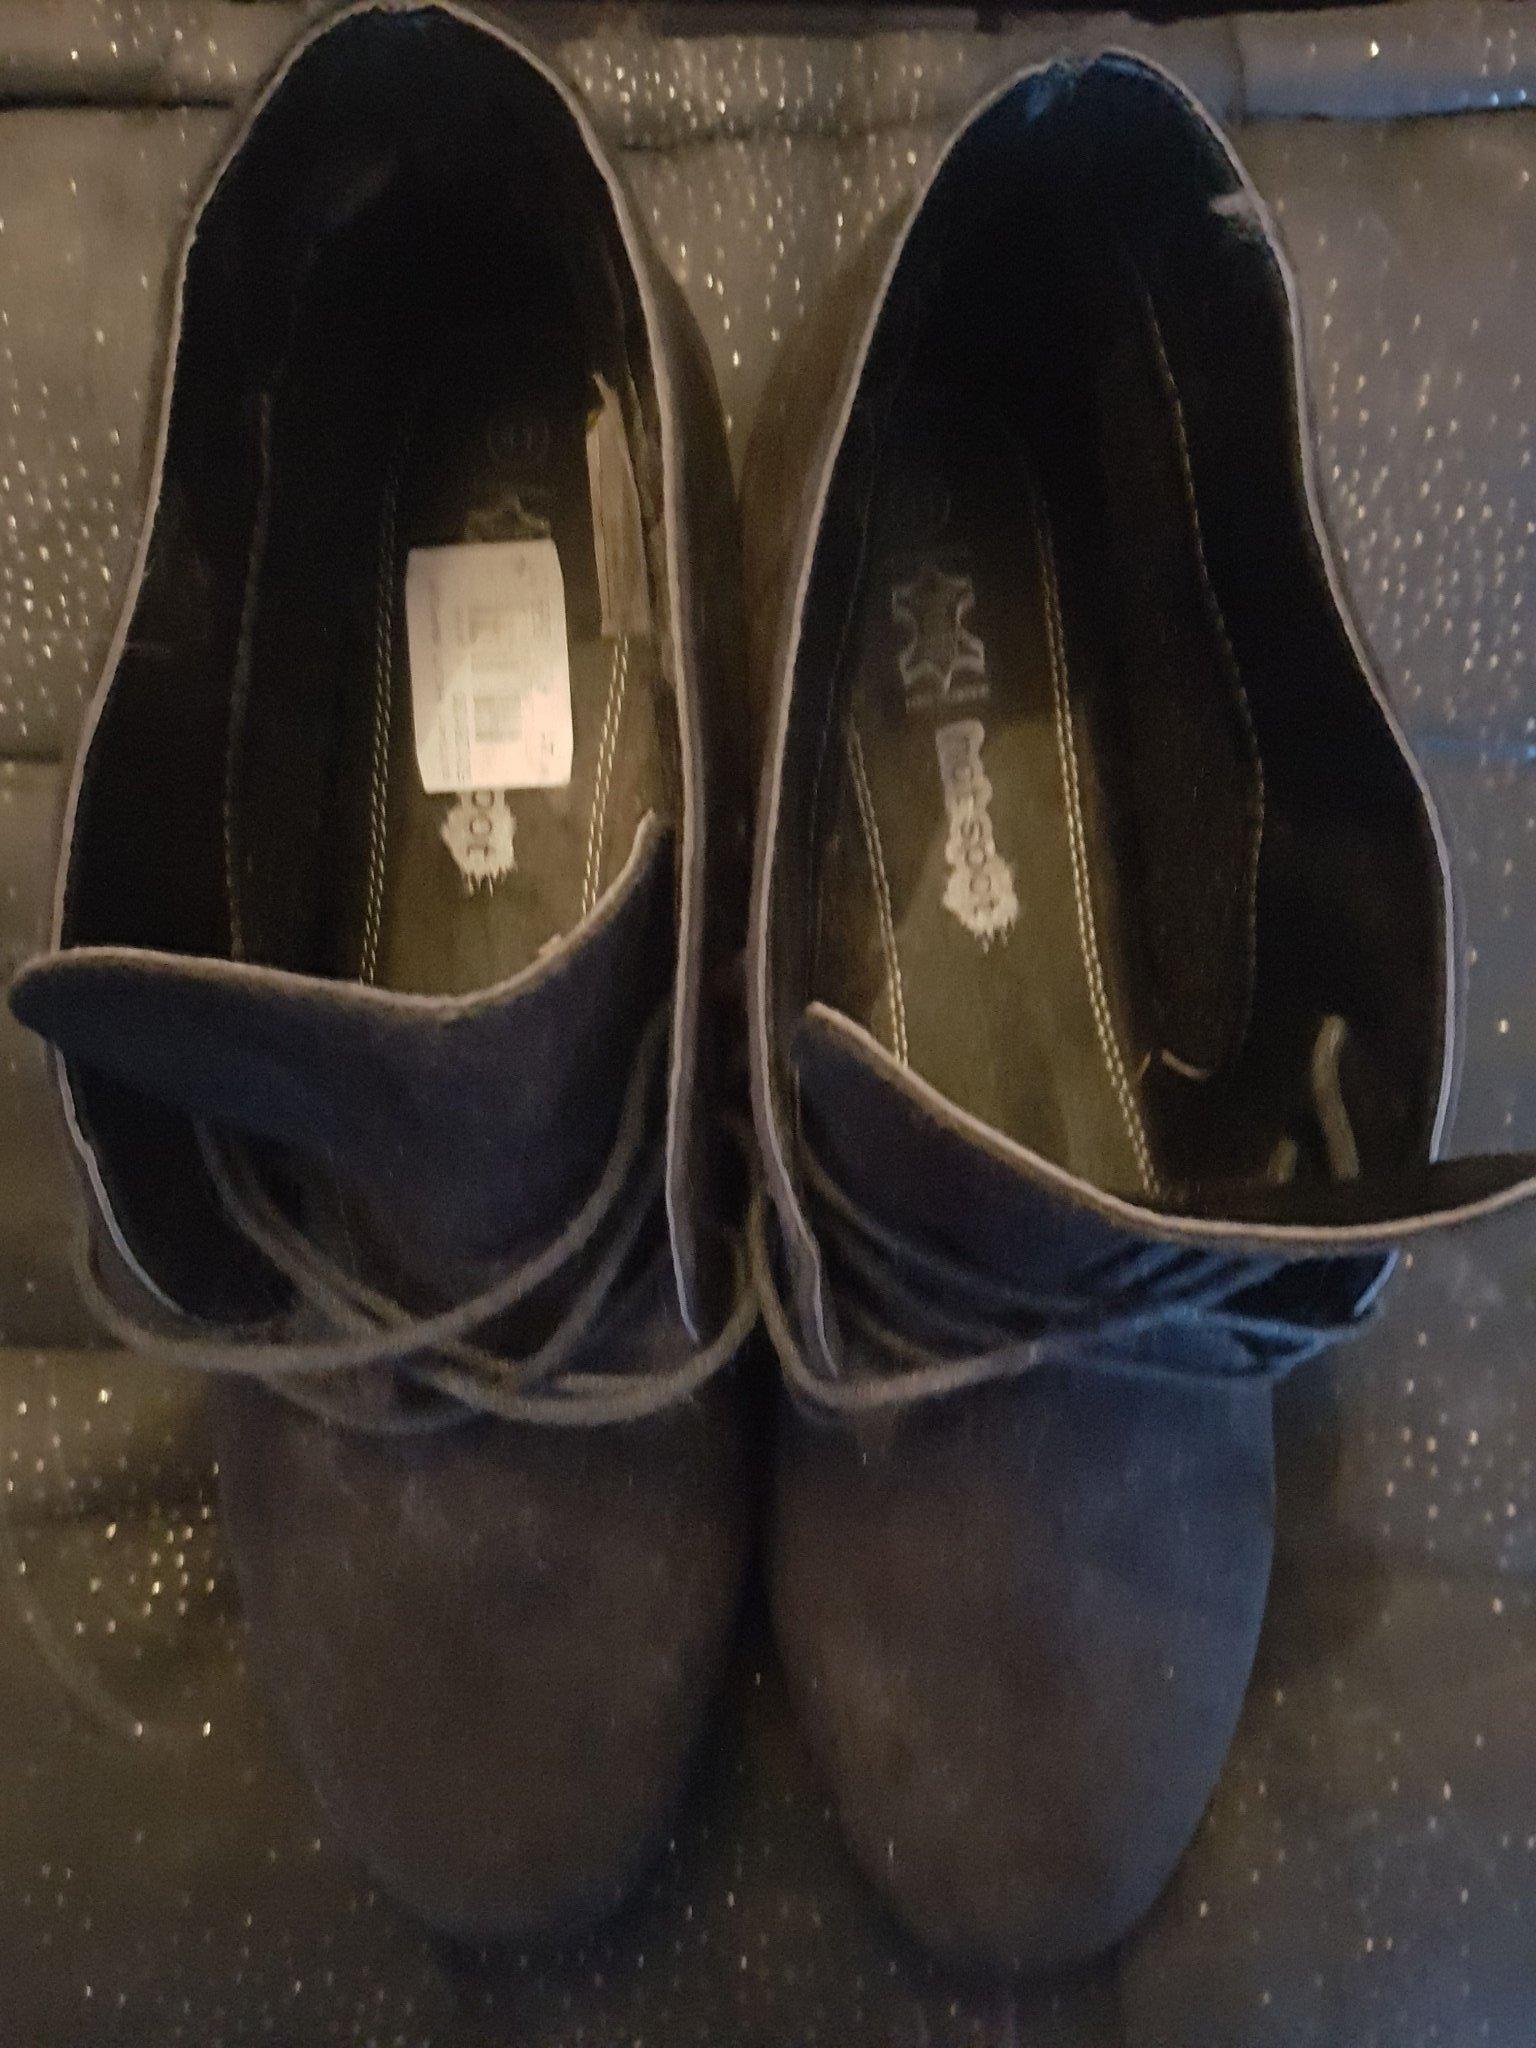 Nya kilklacks skor lite tjockare sula,41,399kr.. (373810424